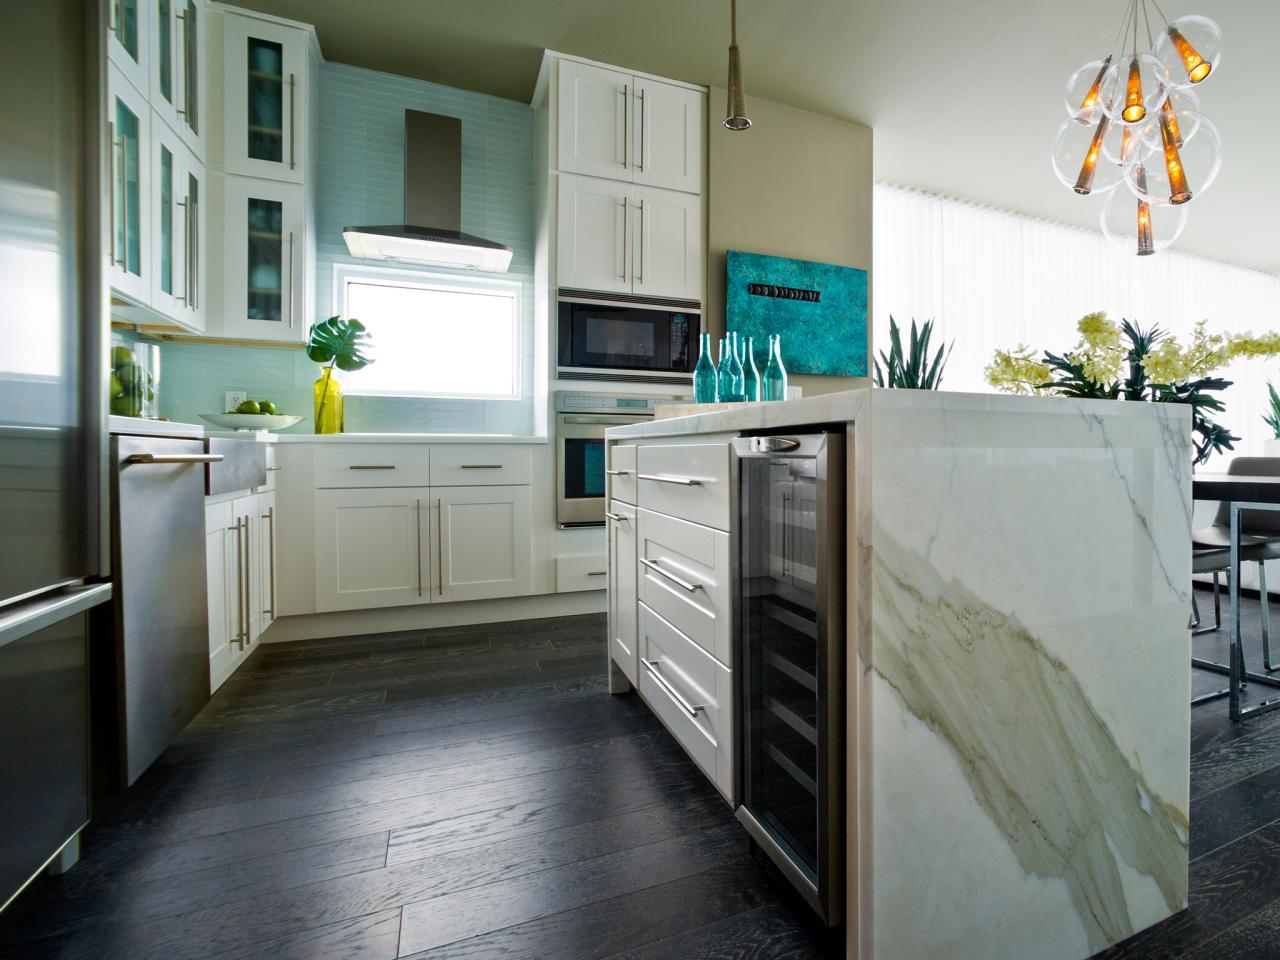 Kitchen Island 6 Feet which kitchen is your favorite? | hgtv urban oasis sweepstakes | hgtv